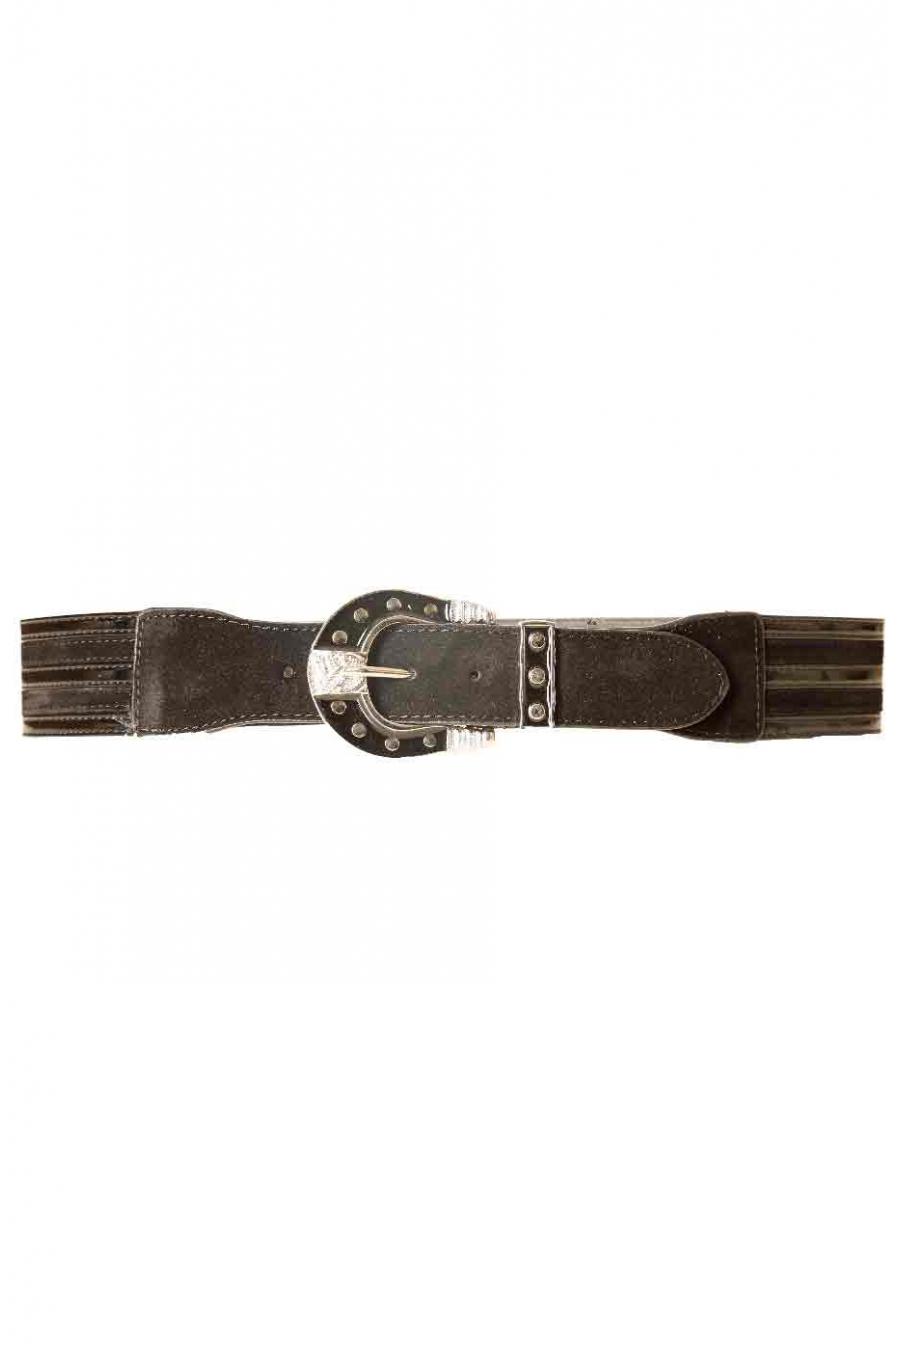 Wide black belt with black fancy buckle BG-0088